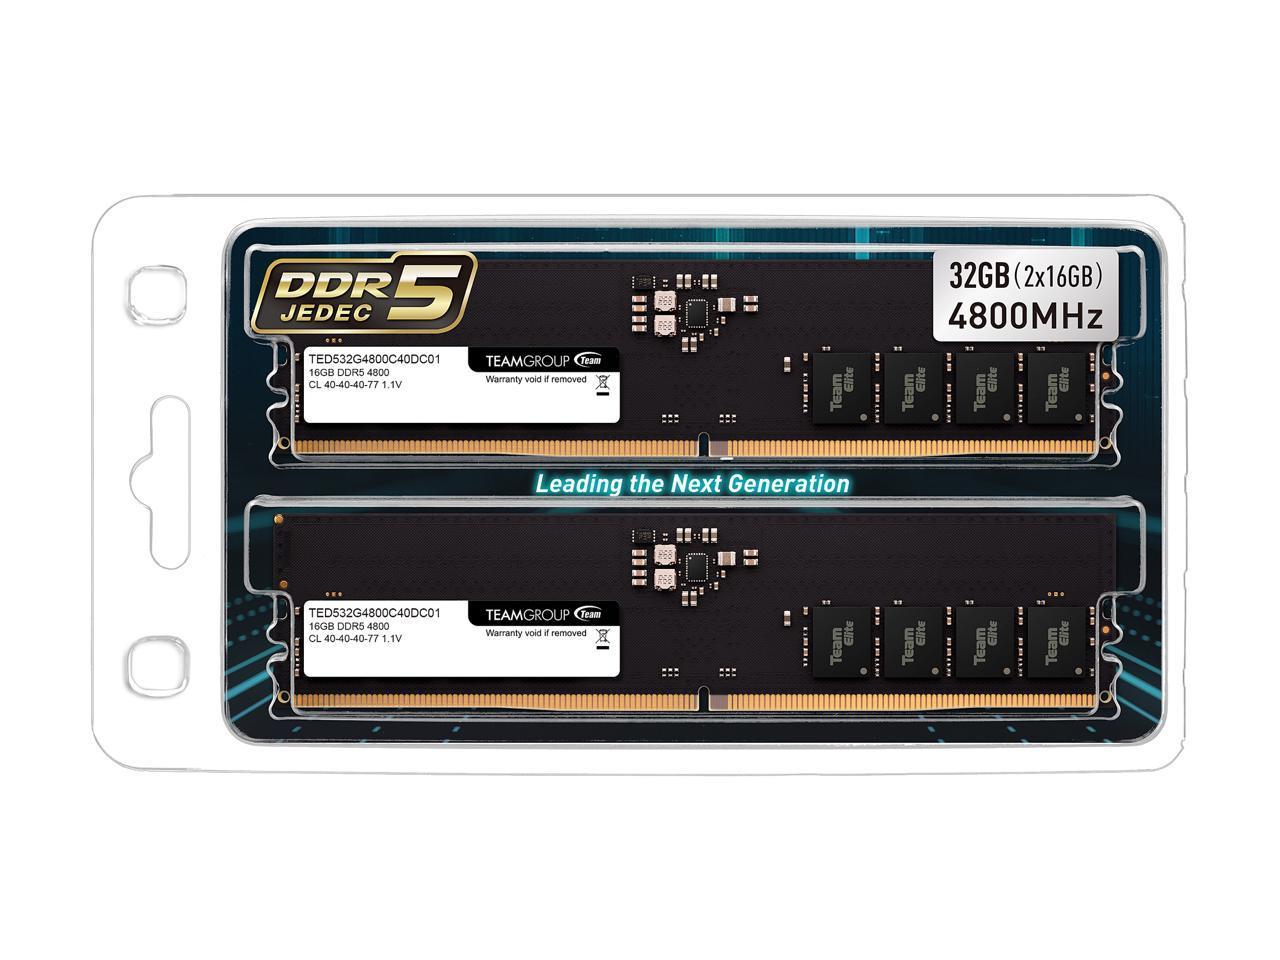 teamgroup-ddr5-4800-32-gb-memory-kit-elite-series-_5